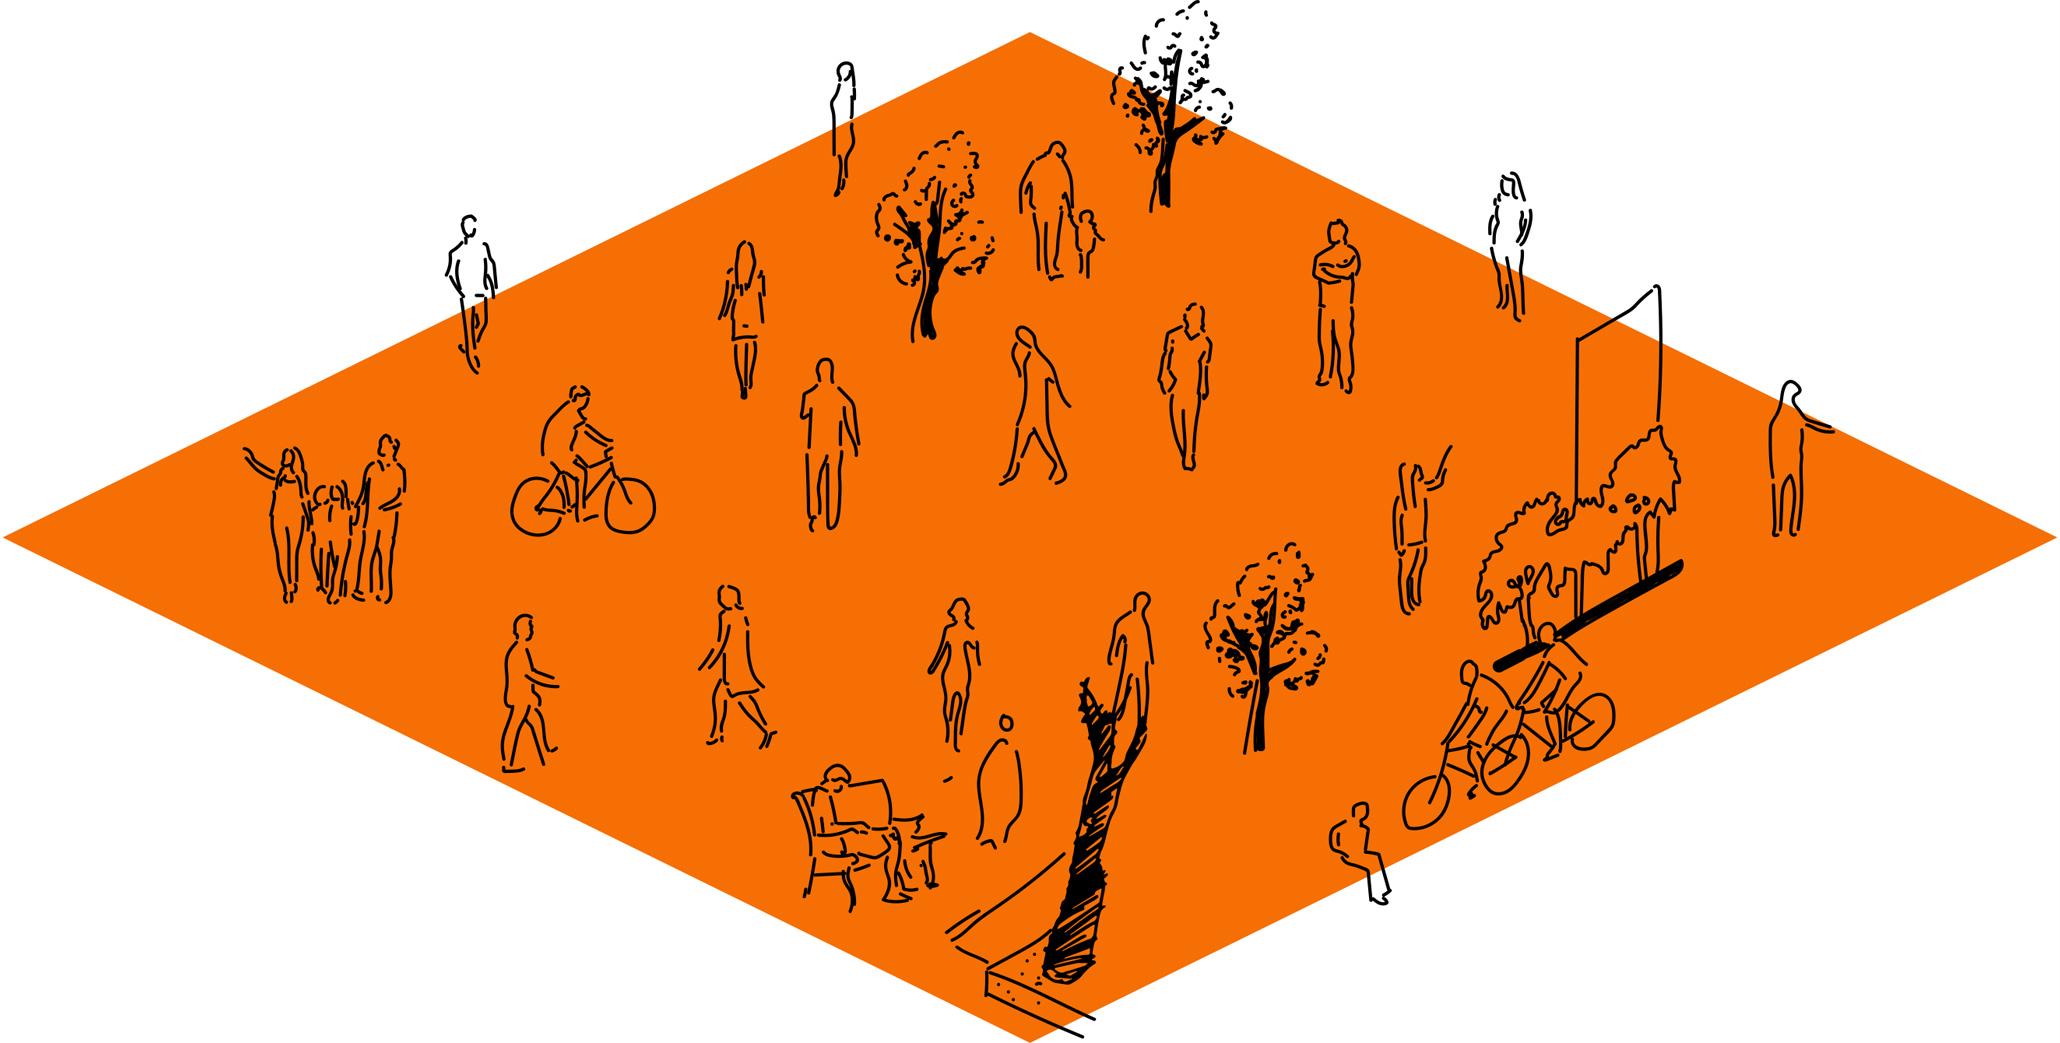 09_CRS_Illustration.jpg